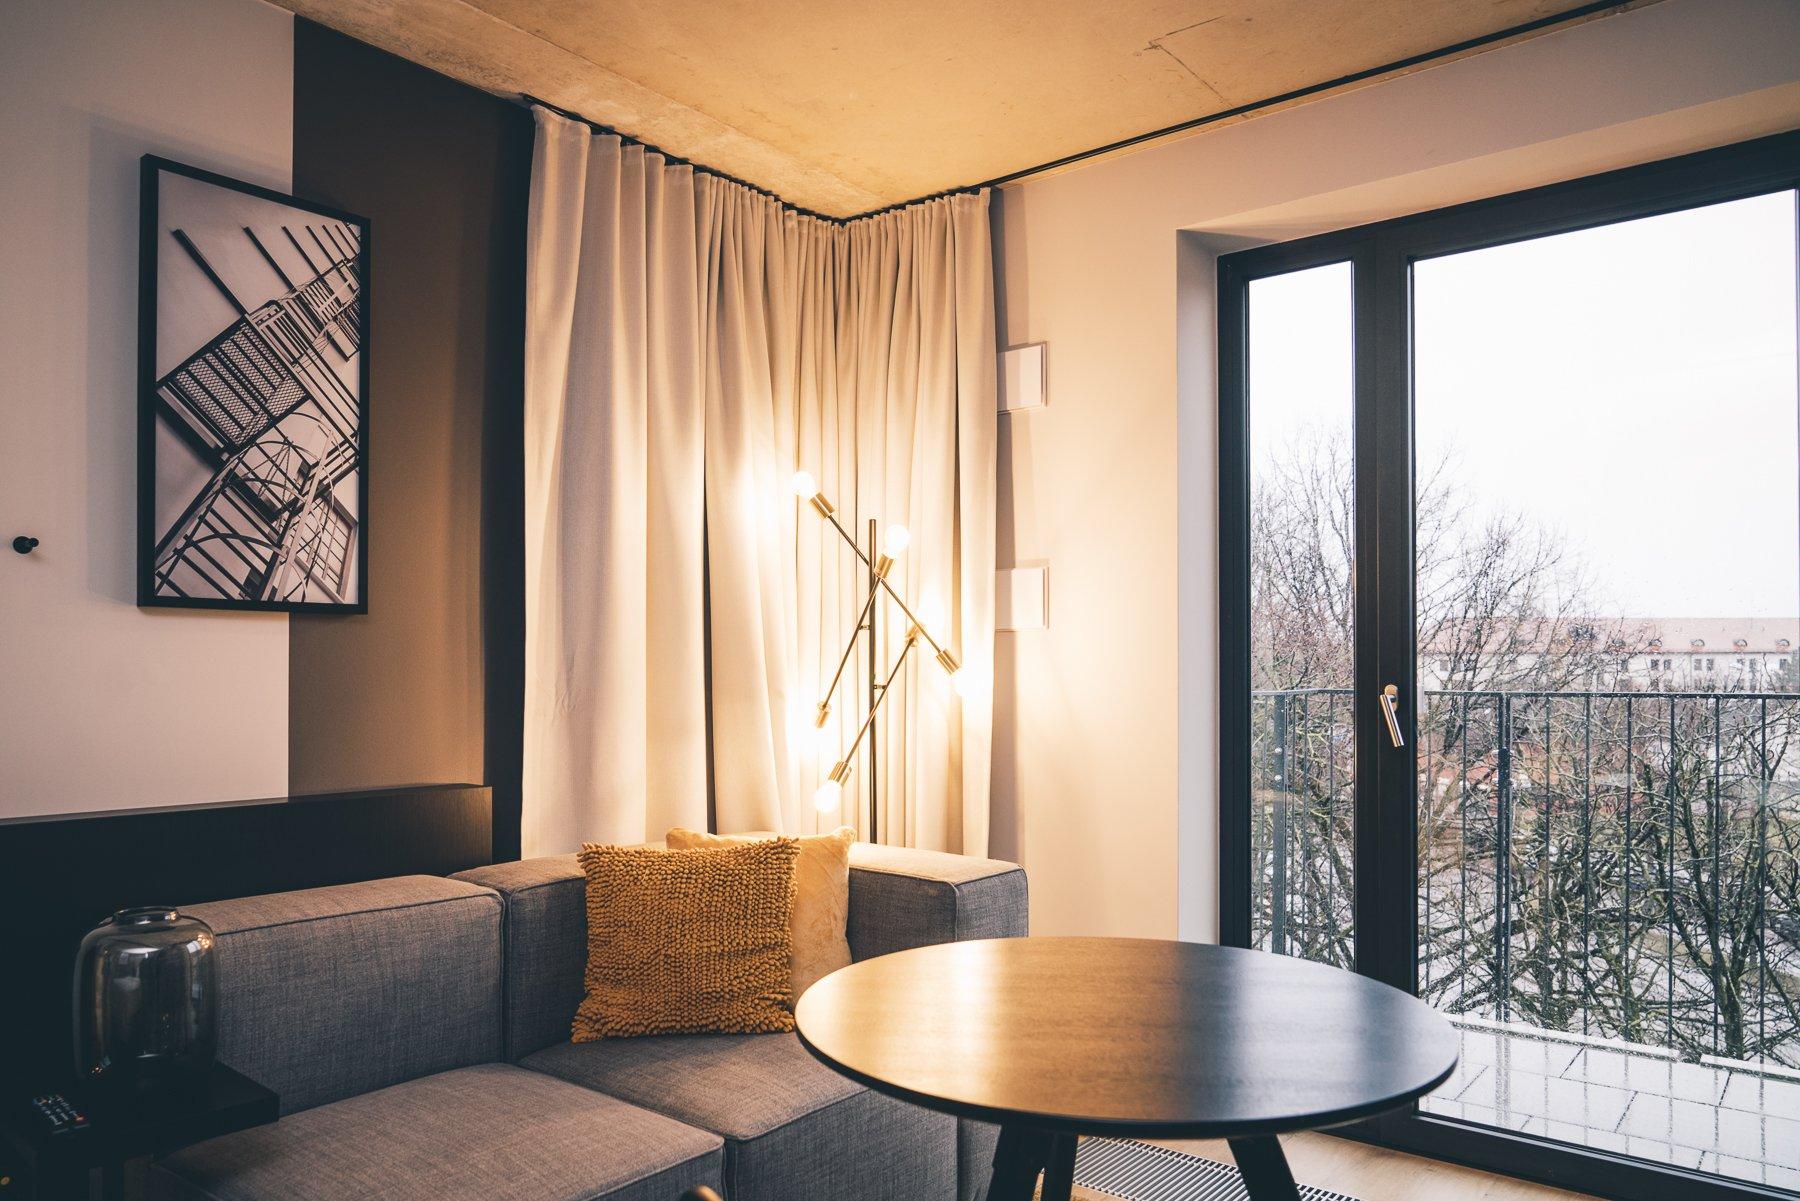 Geheimtipp Muenchen Hotel Joyn Apartments6 – ©wunderland media GmbH